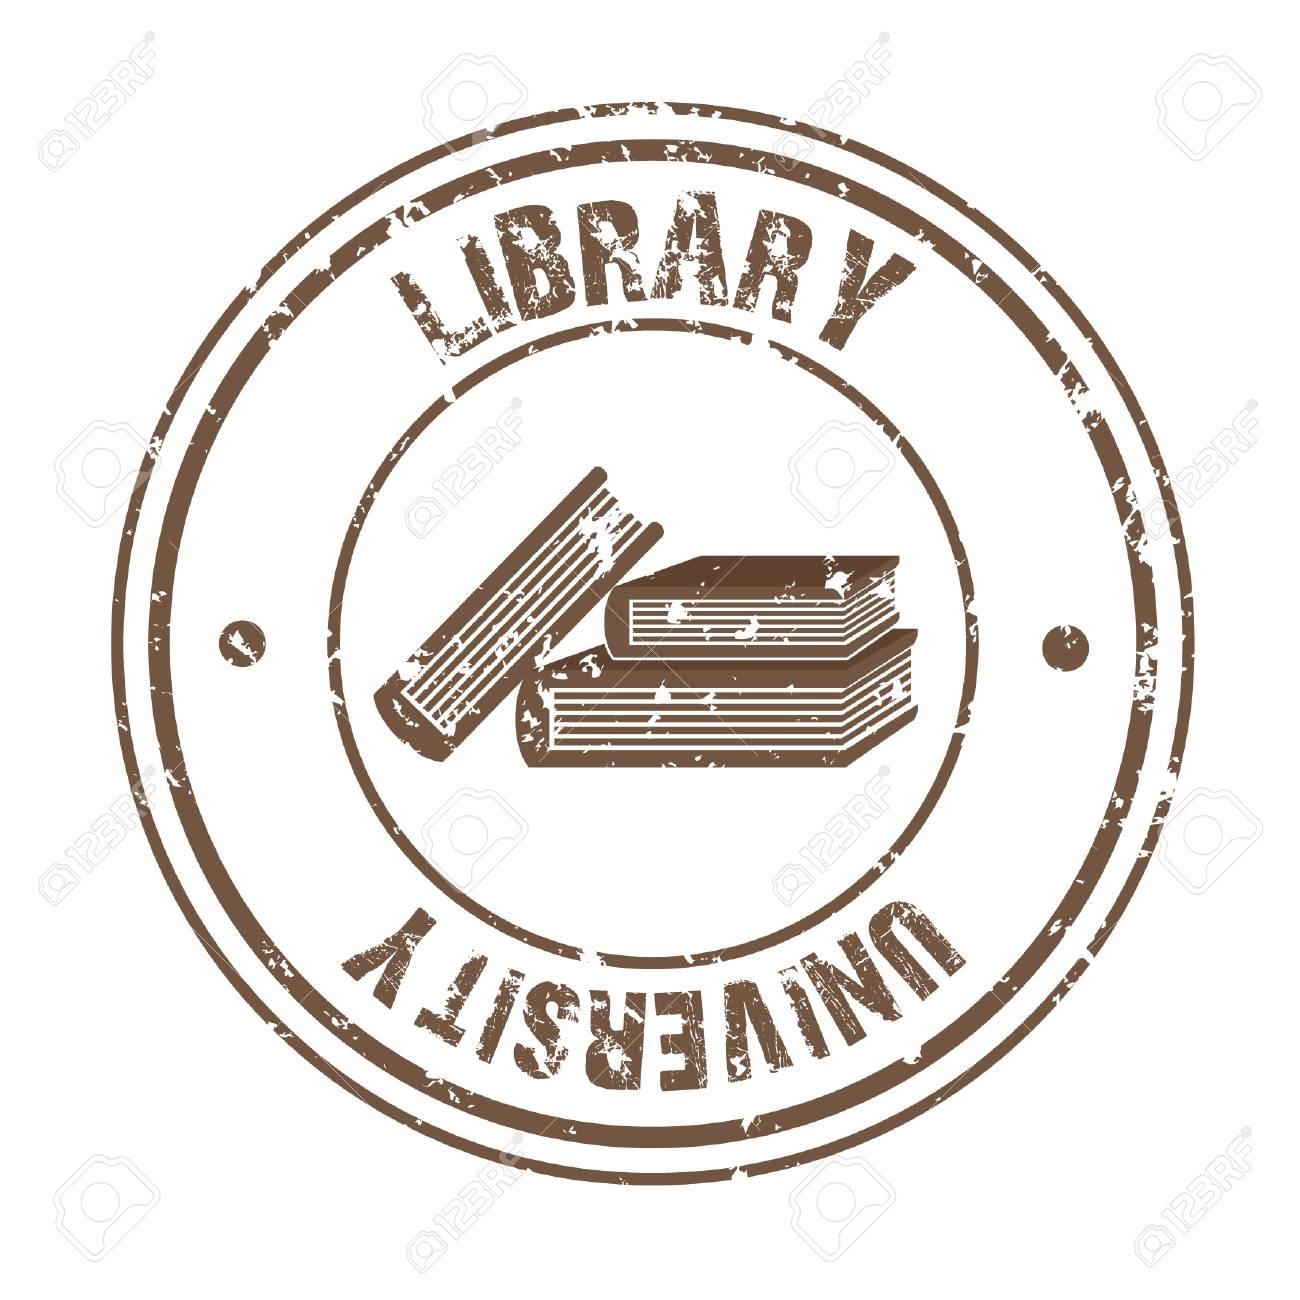 library university over white background vector illustration Stock Vector - 22266784